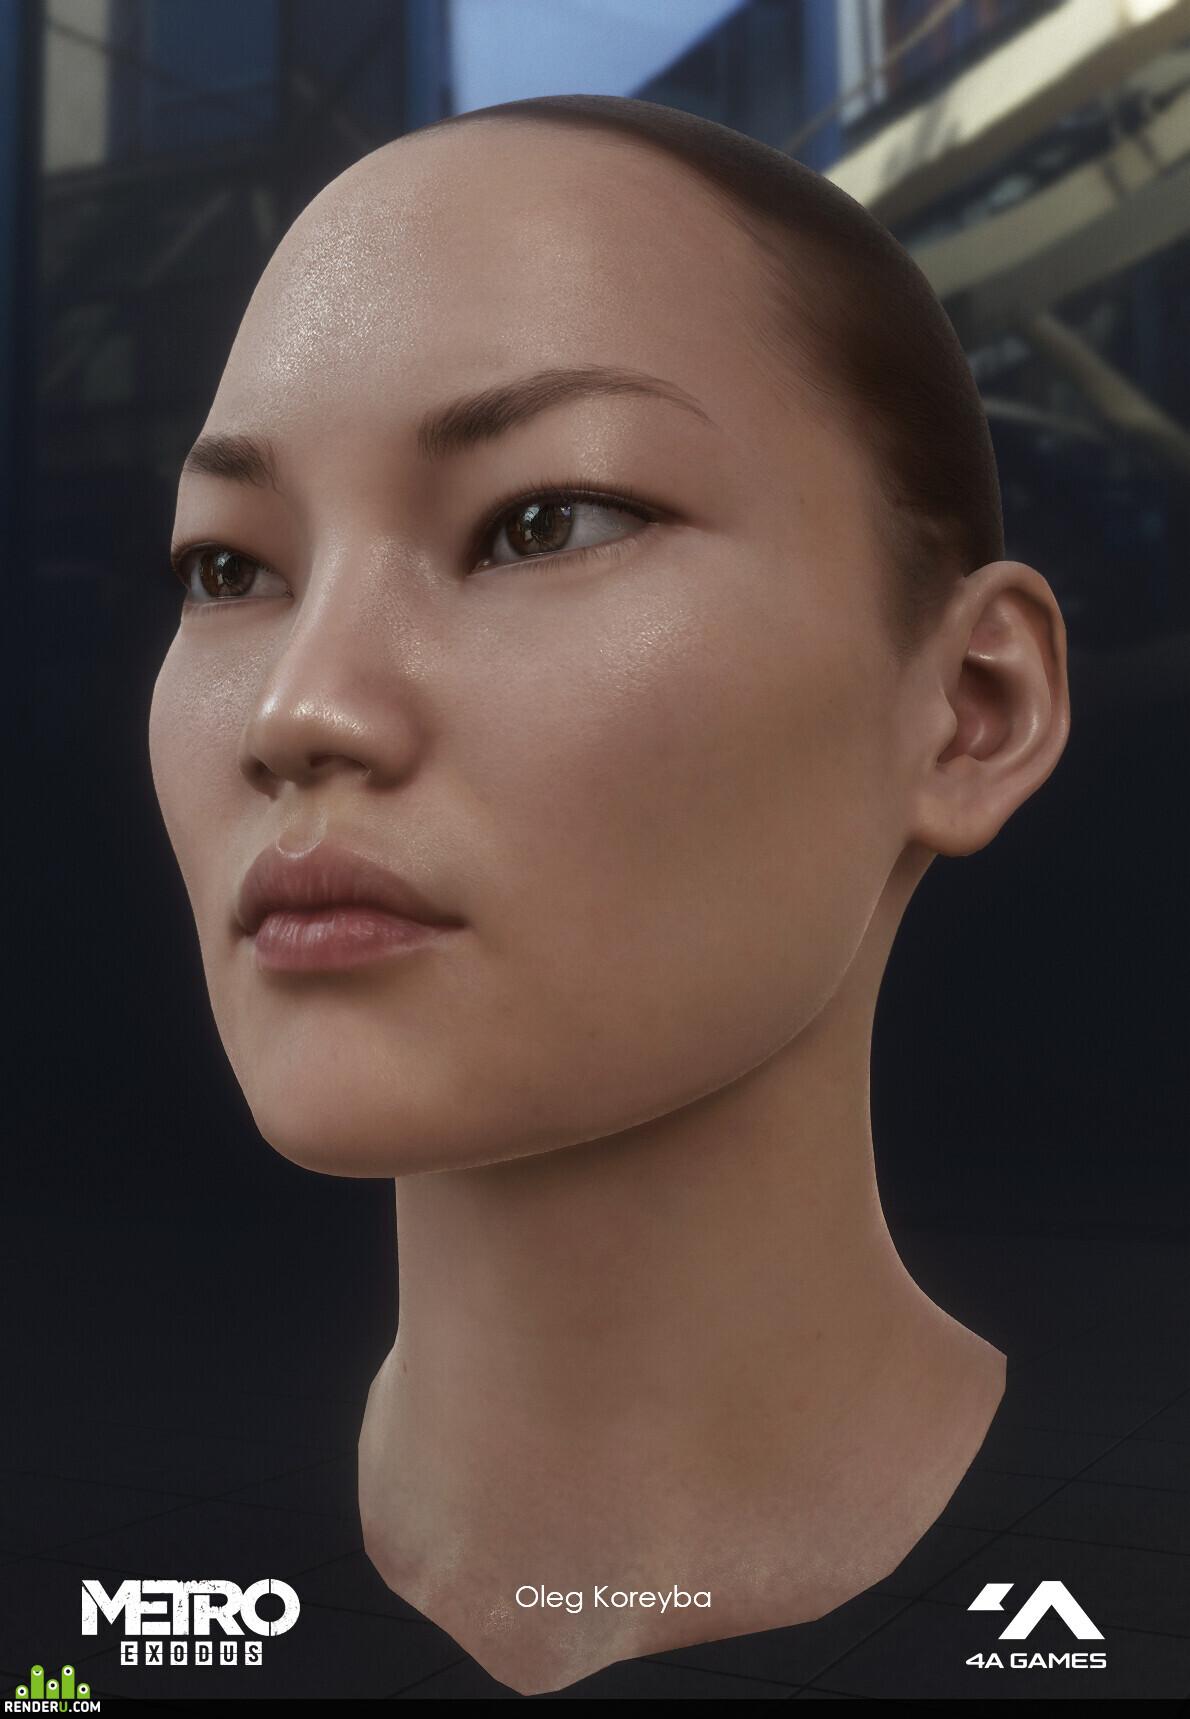 Персонажи, персонаж, игровой персонаж, женскийперсонаж, 3д персонаж, 3d персонажи, Метро Исход, голова, Гульнара